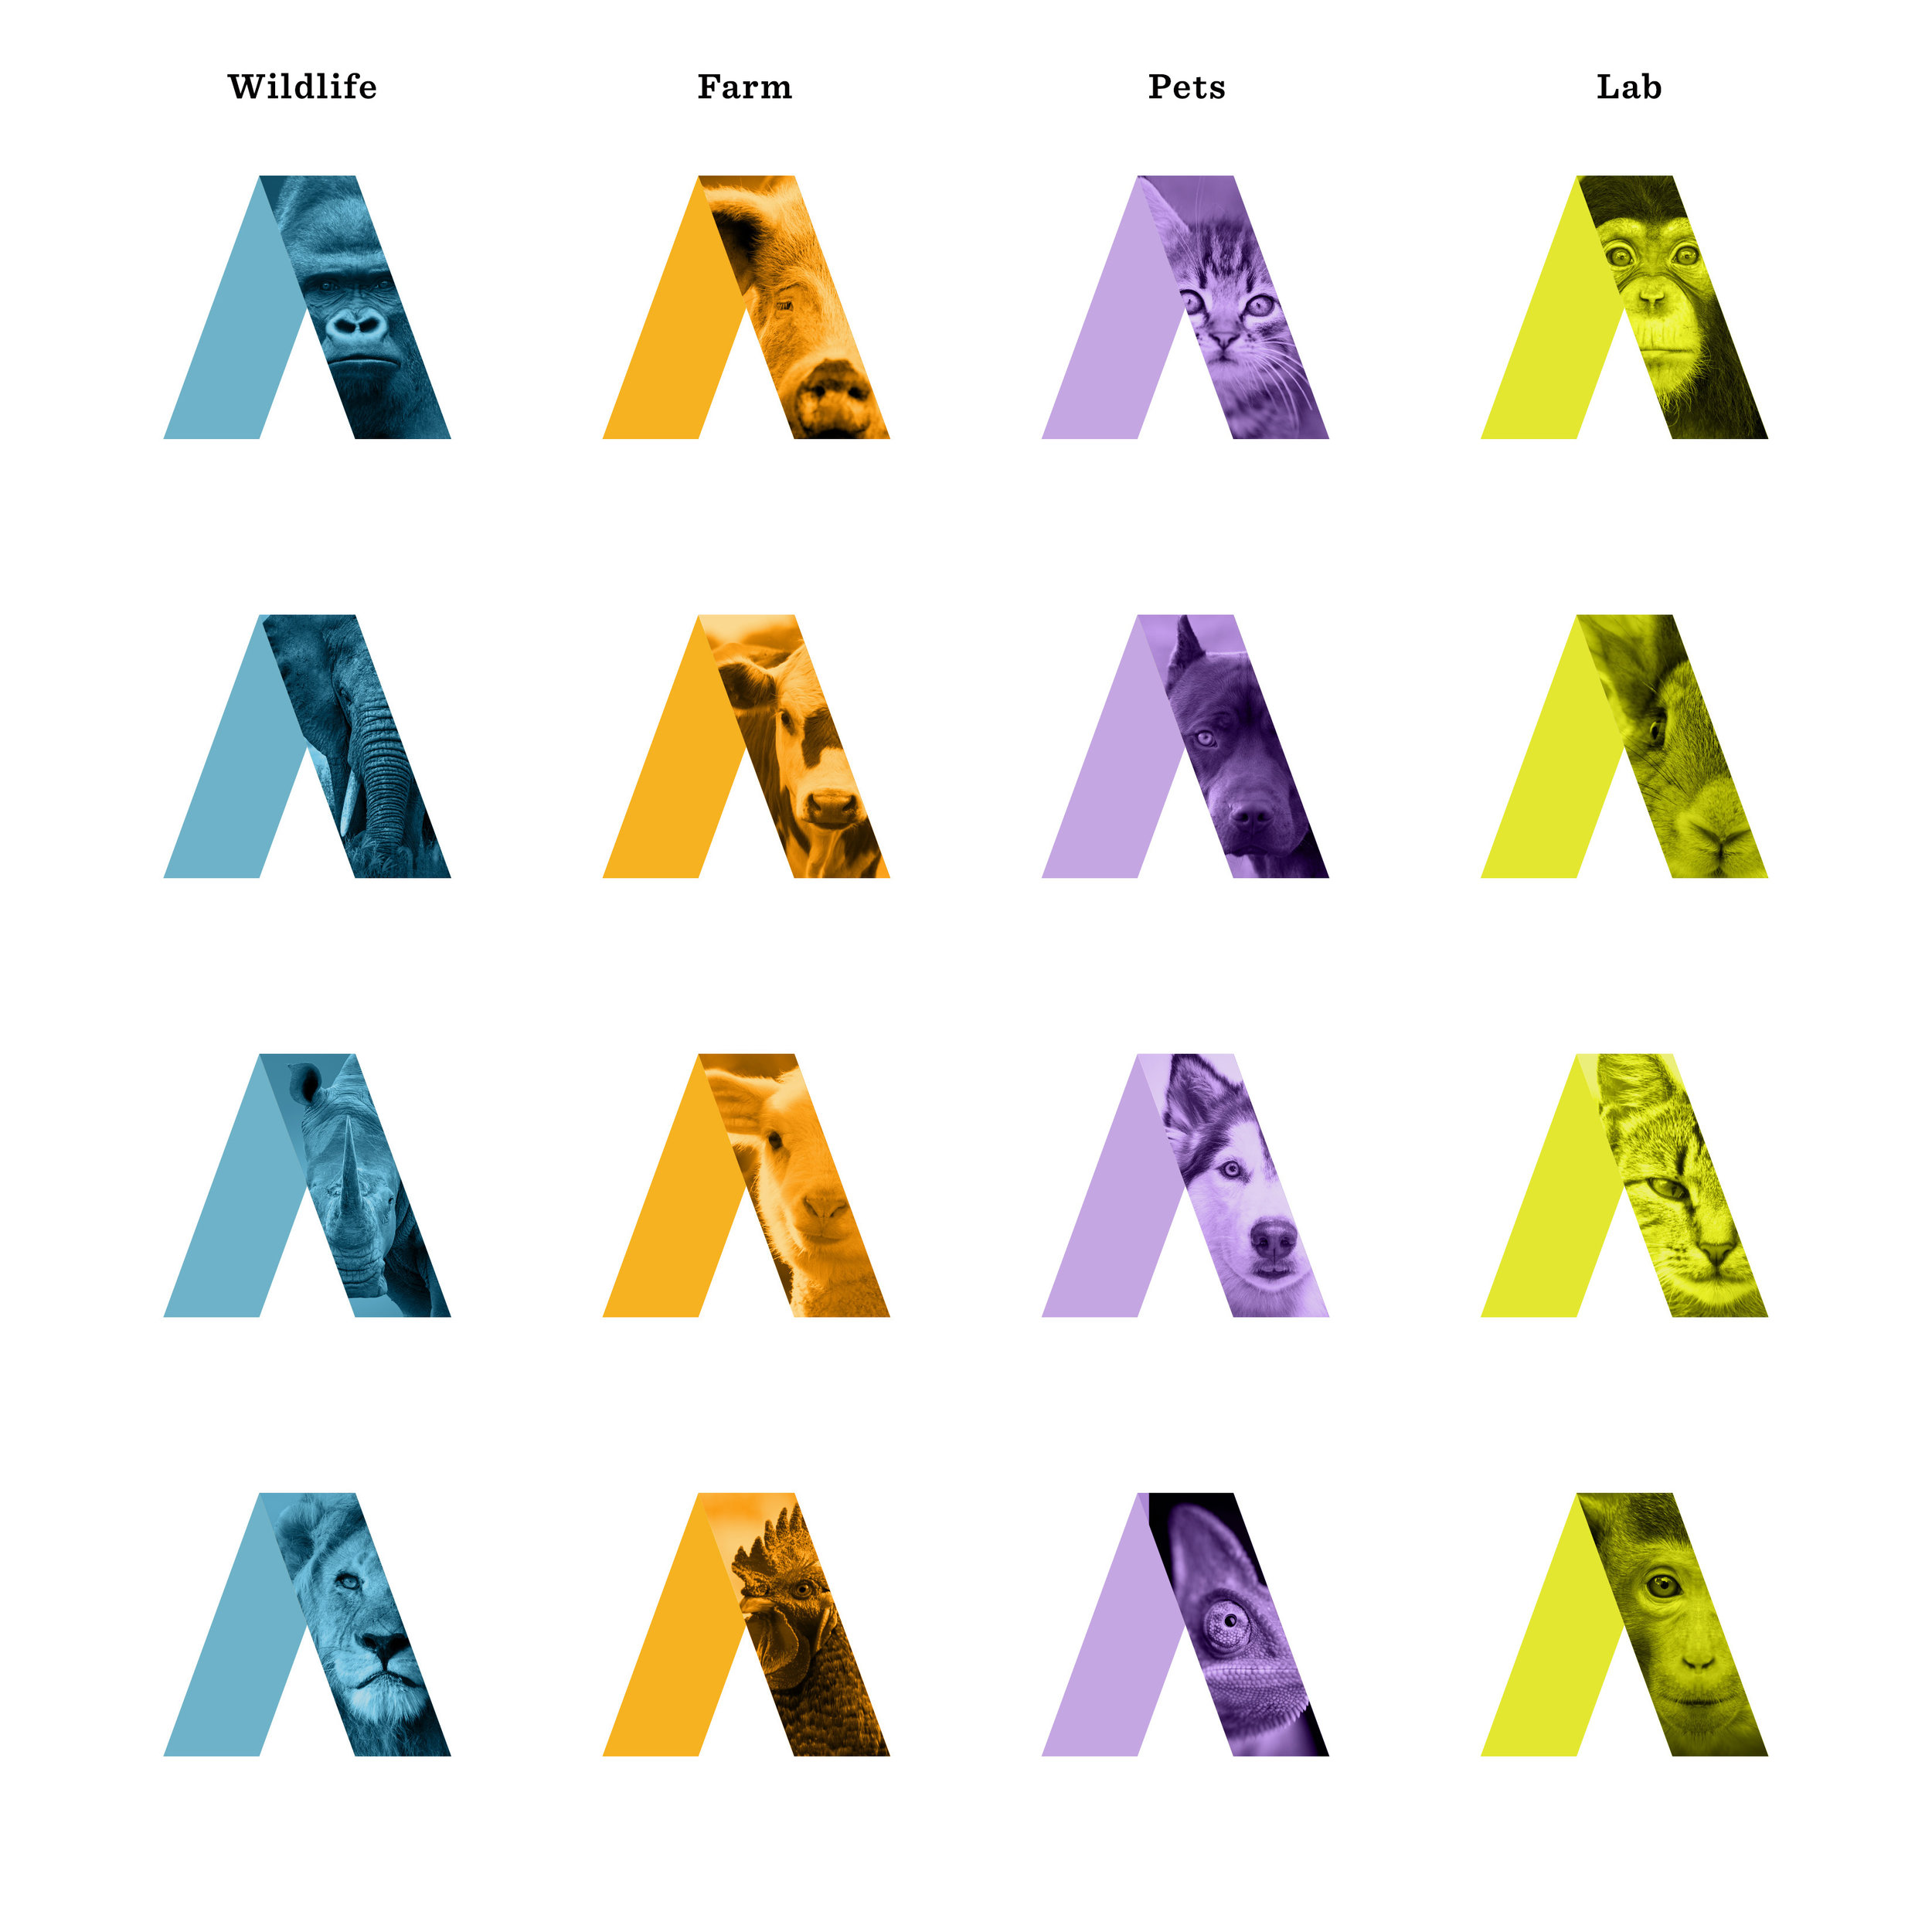 Animal-Matters-Color-Brand-Design-Farm-Lab-Wildlife-Pet-Logo-Icons-2A.jpg